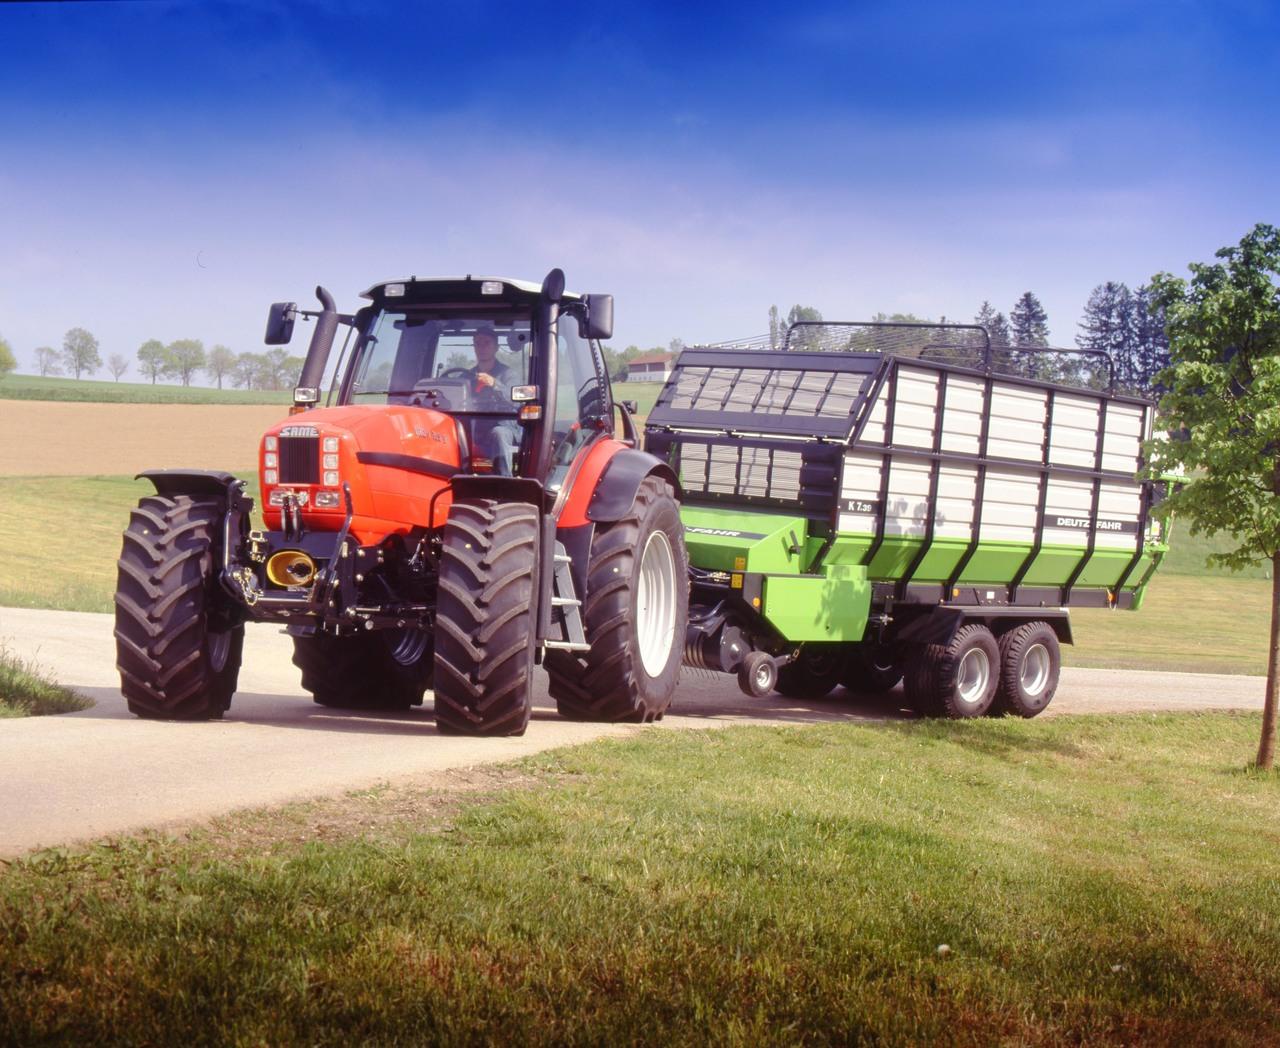 [SAME] trattore Iron 165 S